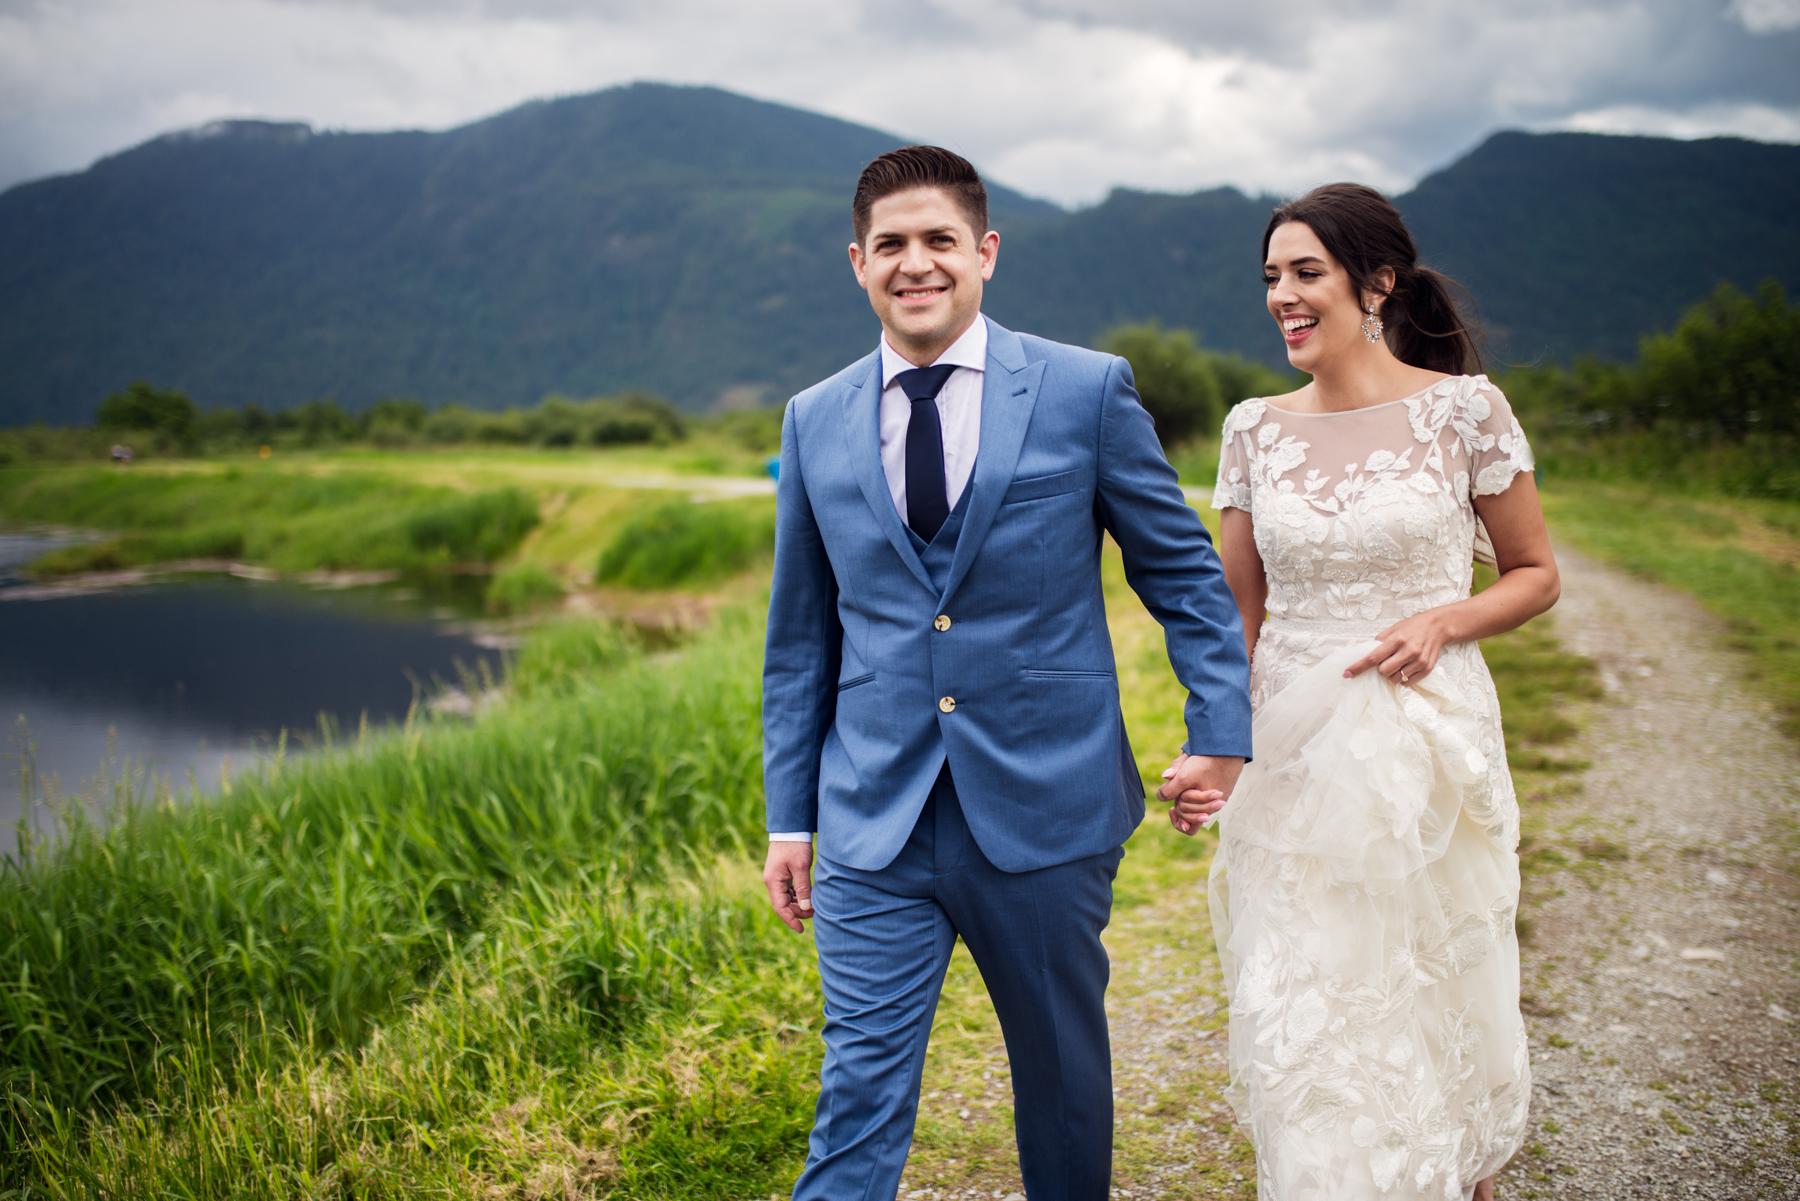 dp-wedding-web-029